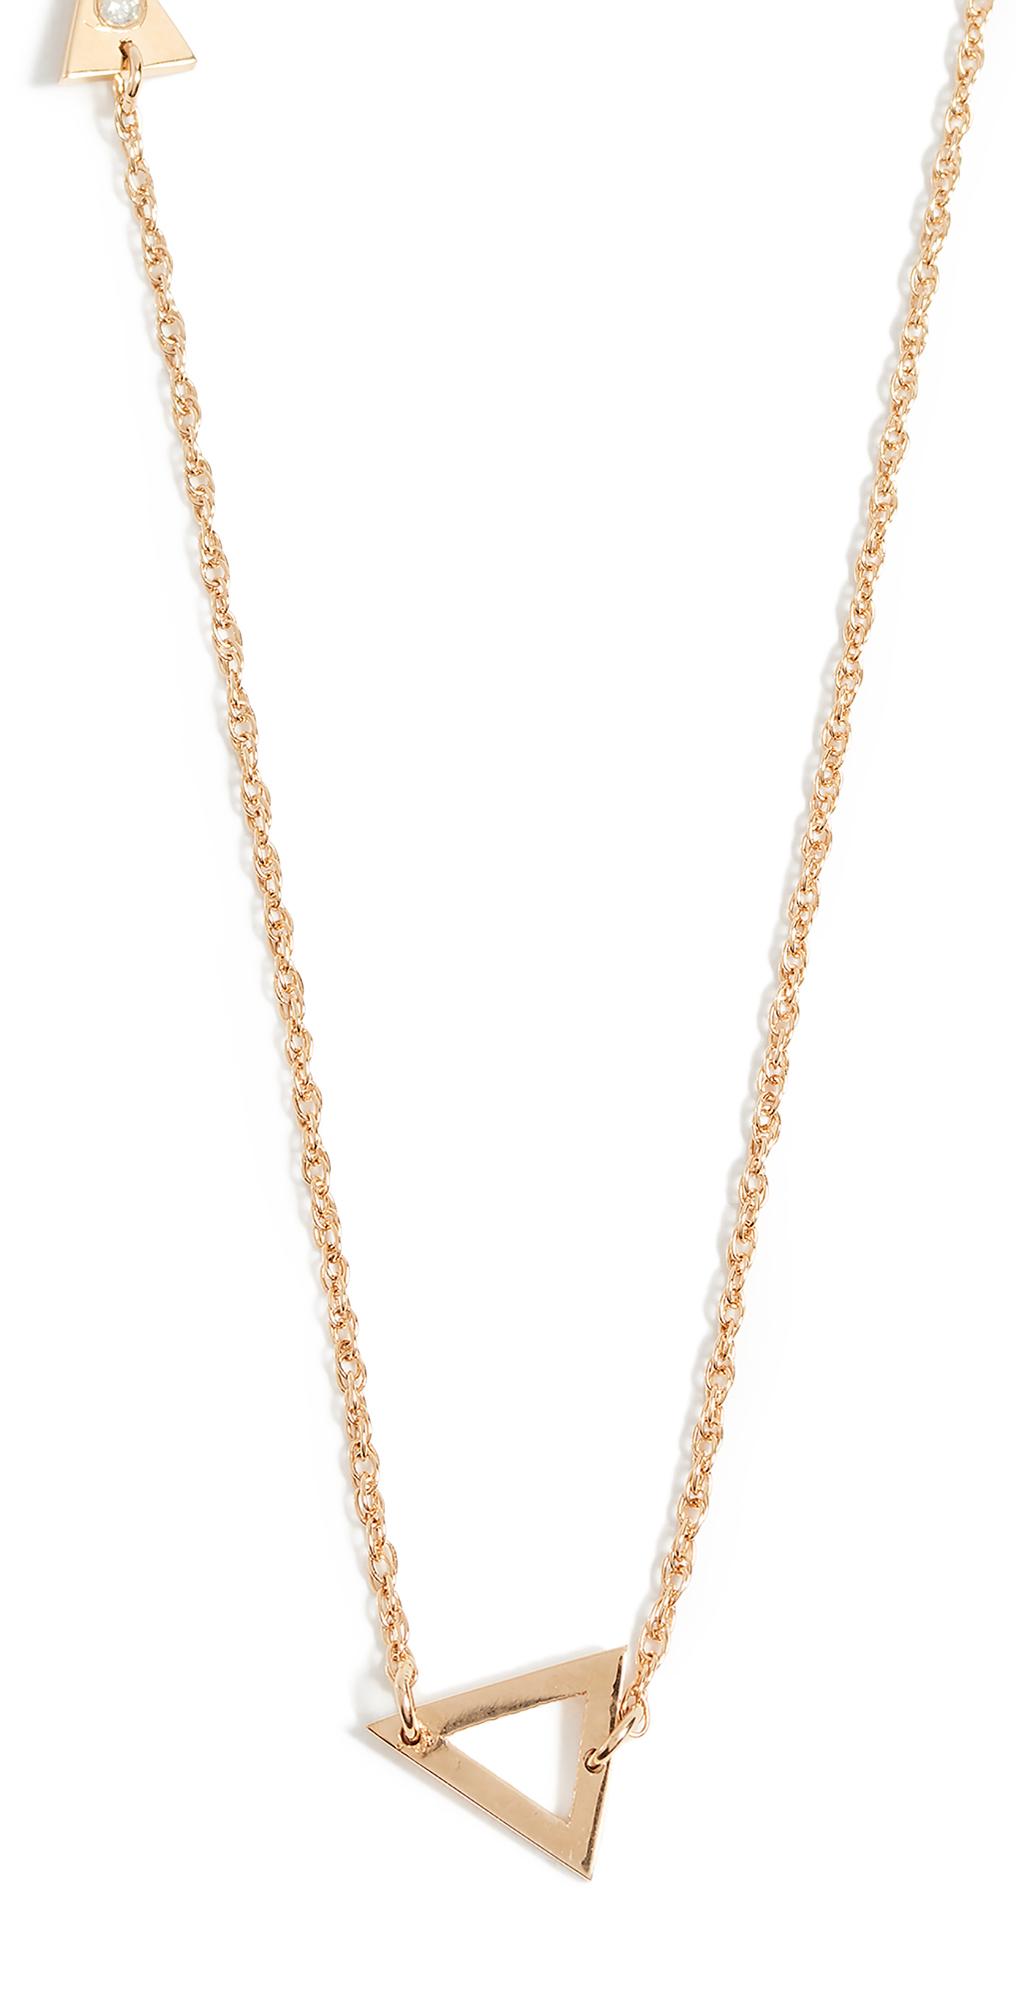 Sasha Diamond Necklace